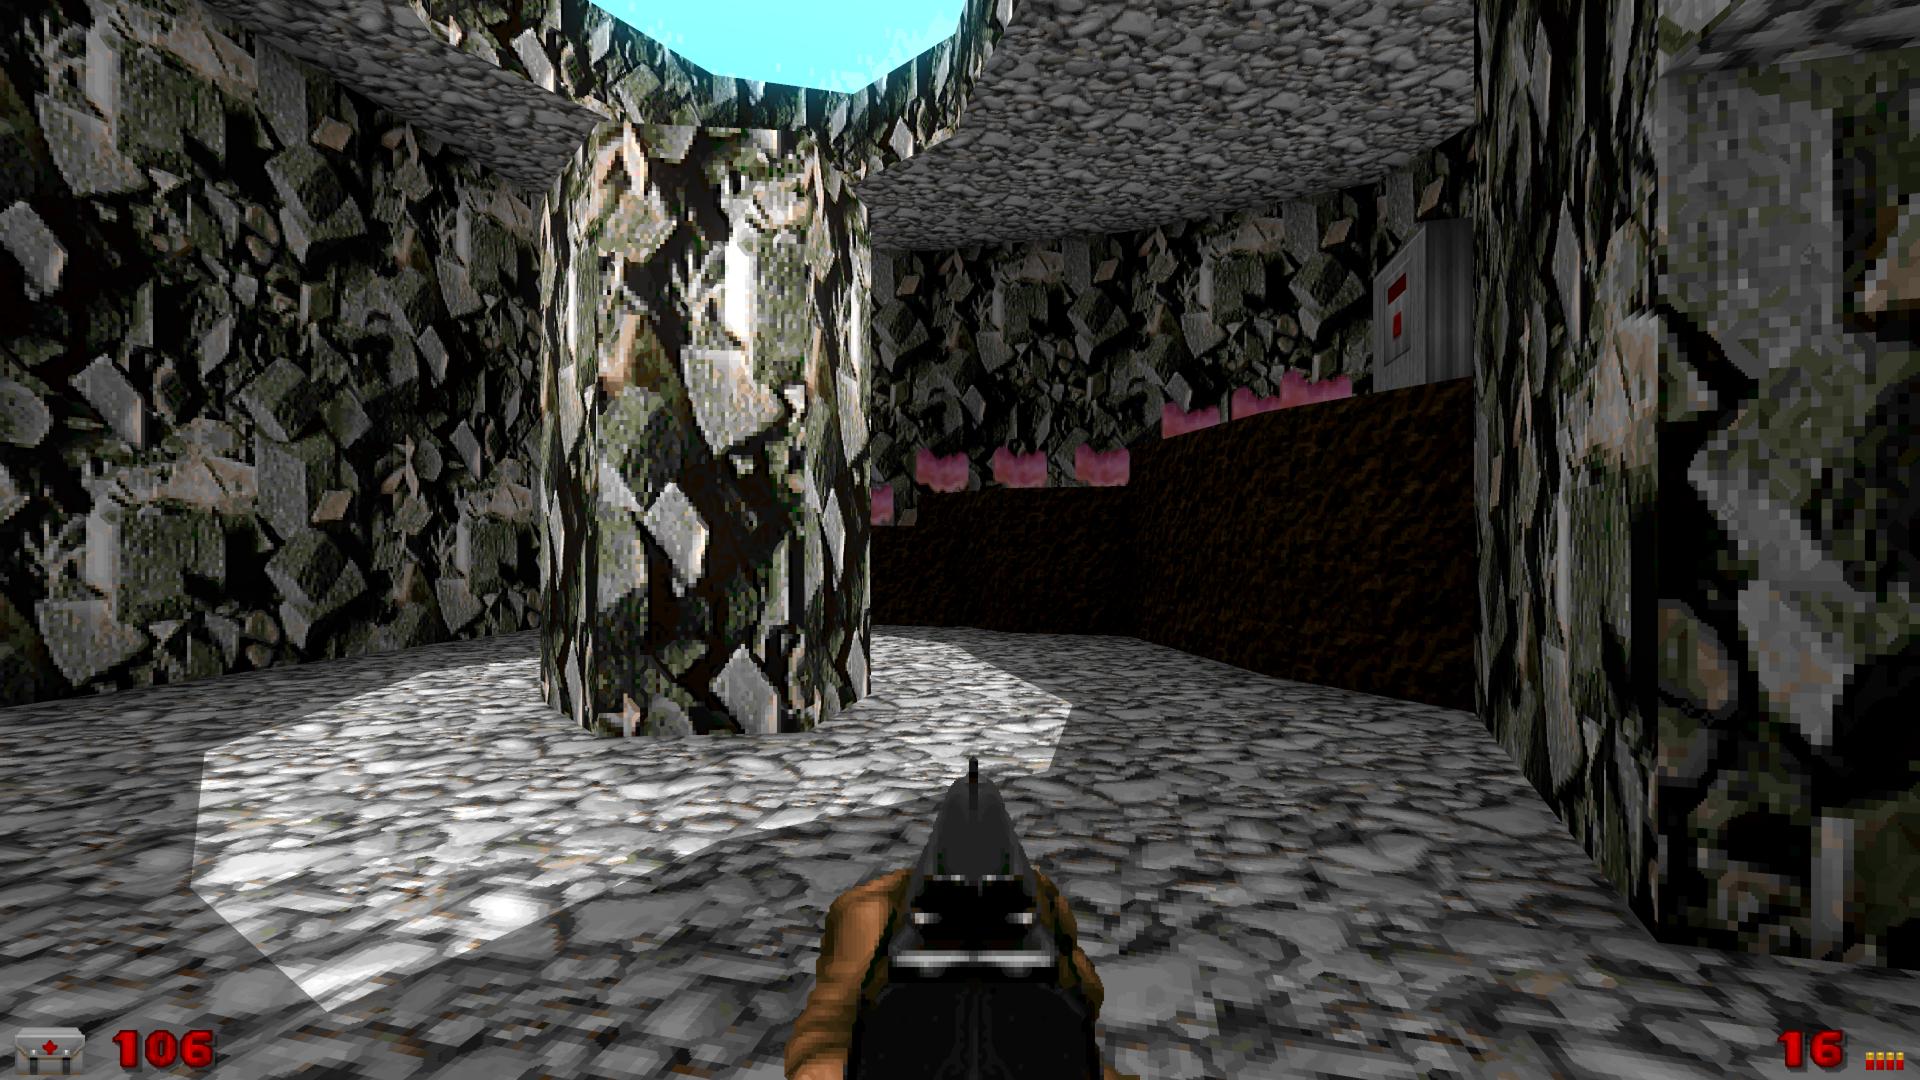 Screenshot_Doom_20210109_181634.png.4c5fe2b206503874edb05e1e70c7381b.png